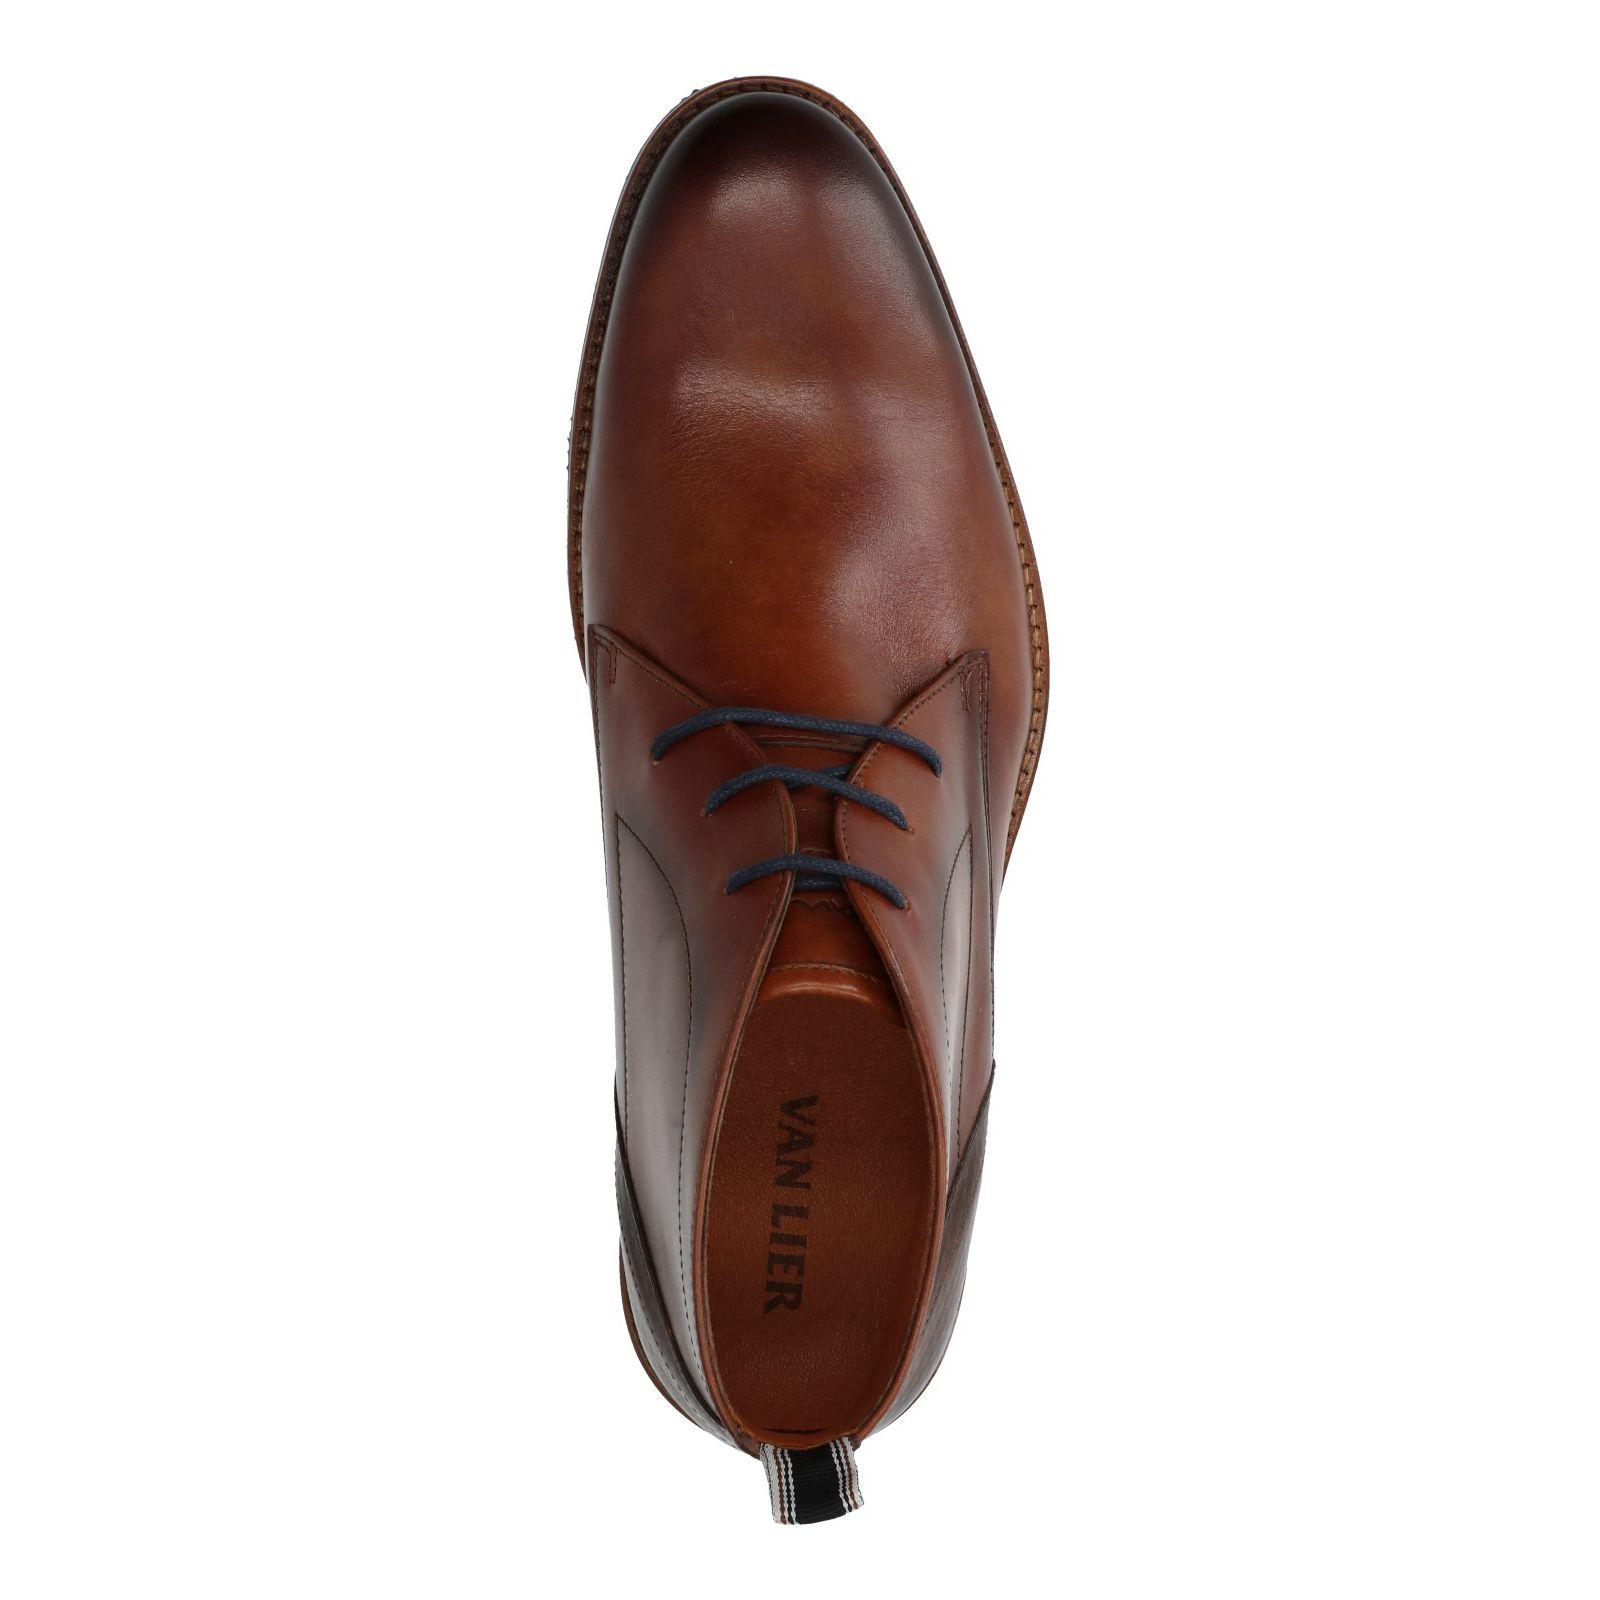 Schnürstiefel aus cognacfarbenem Leder